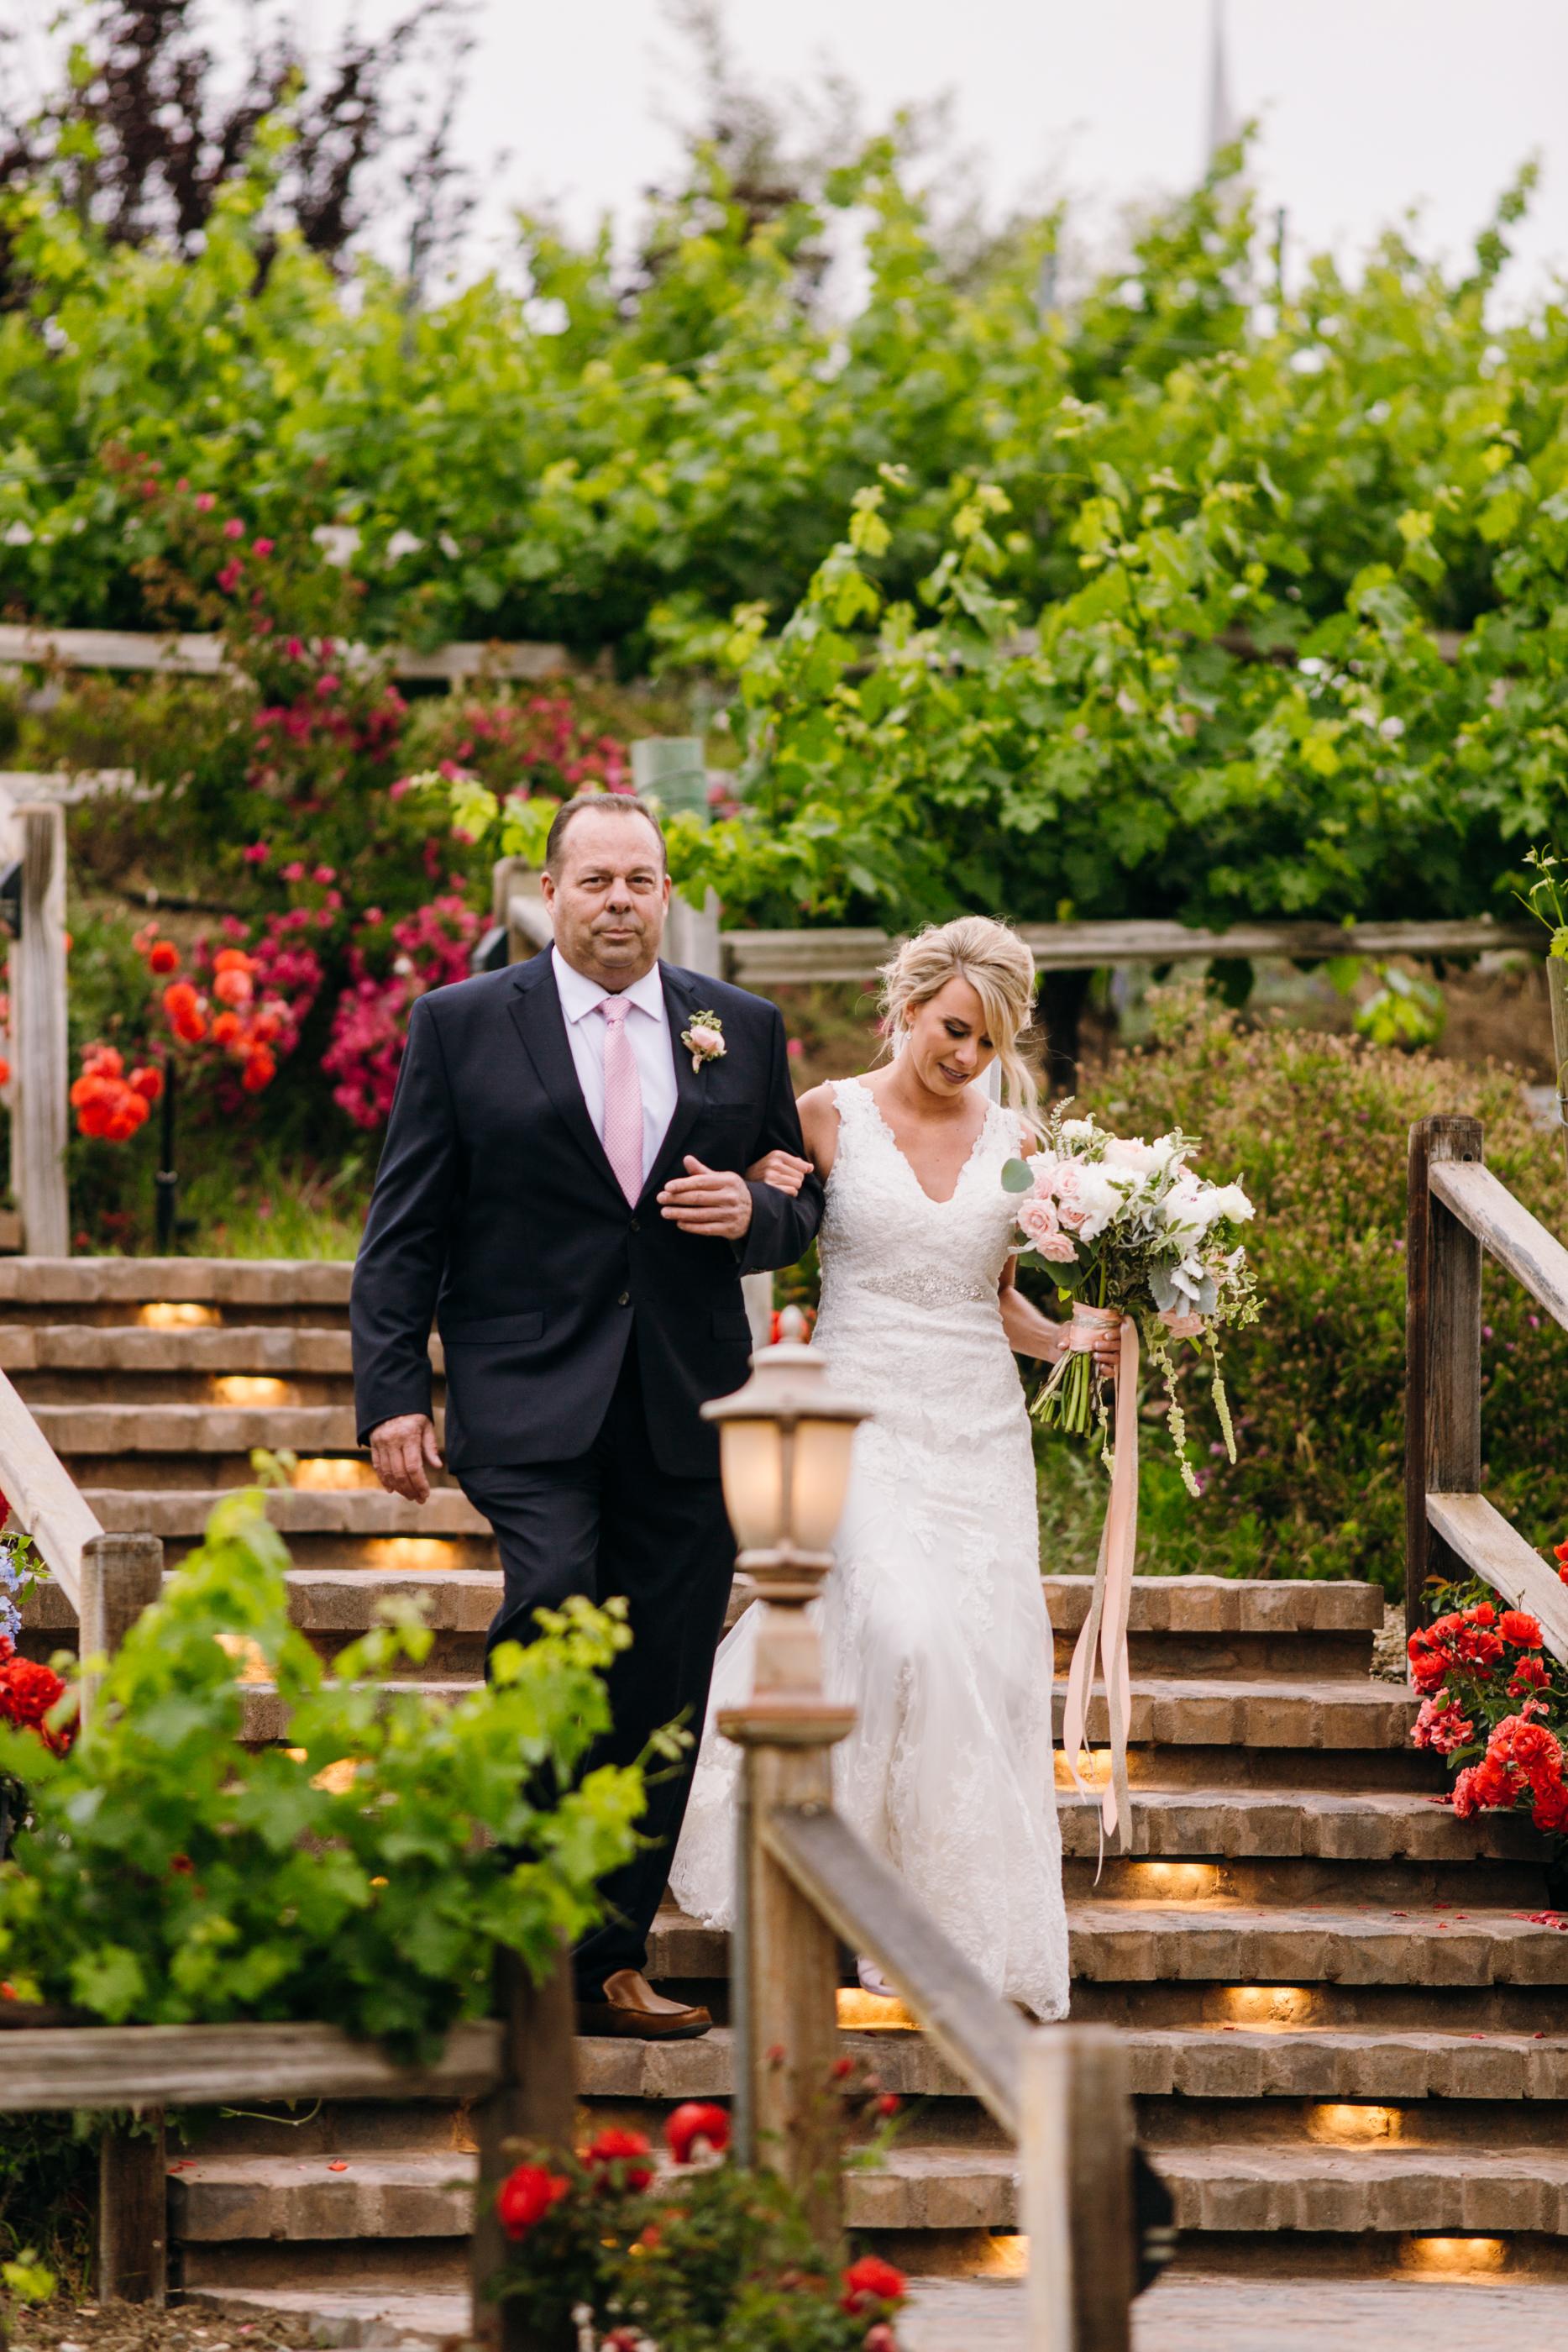 KaraNixonWeddings-LakeOakMeadows-Temecula-Wedding-29.jpg